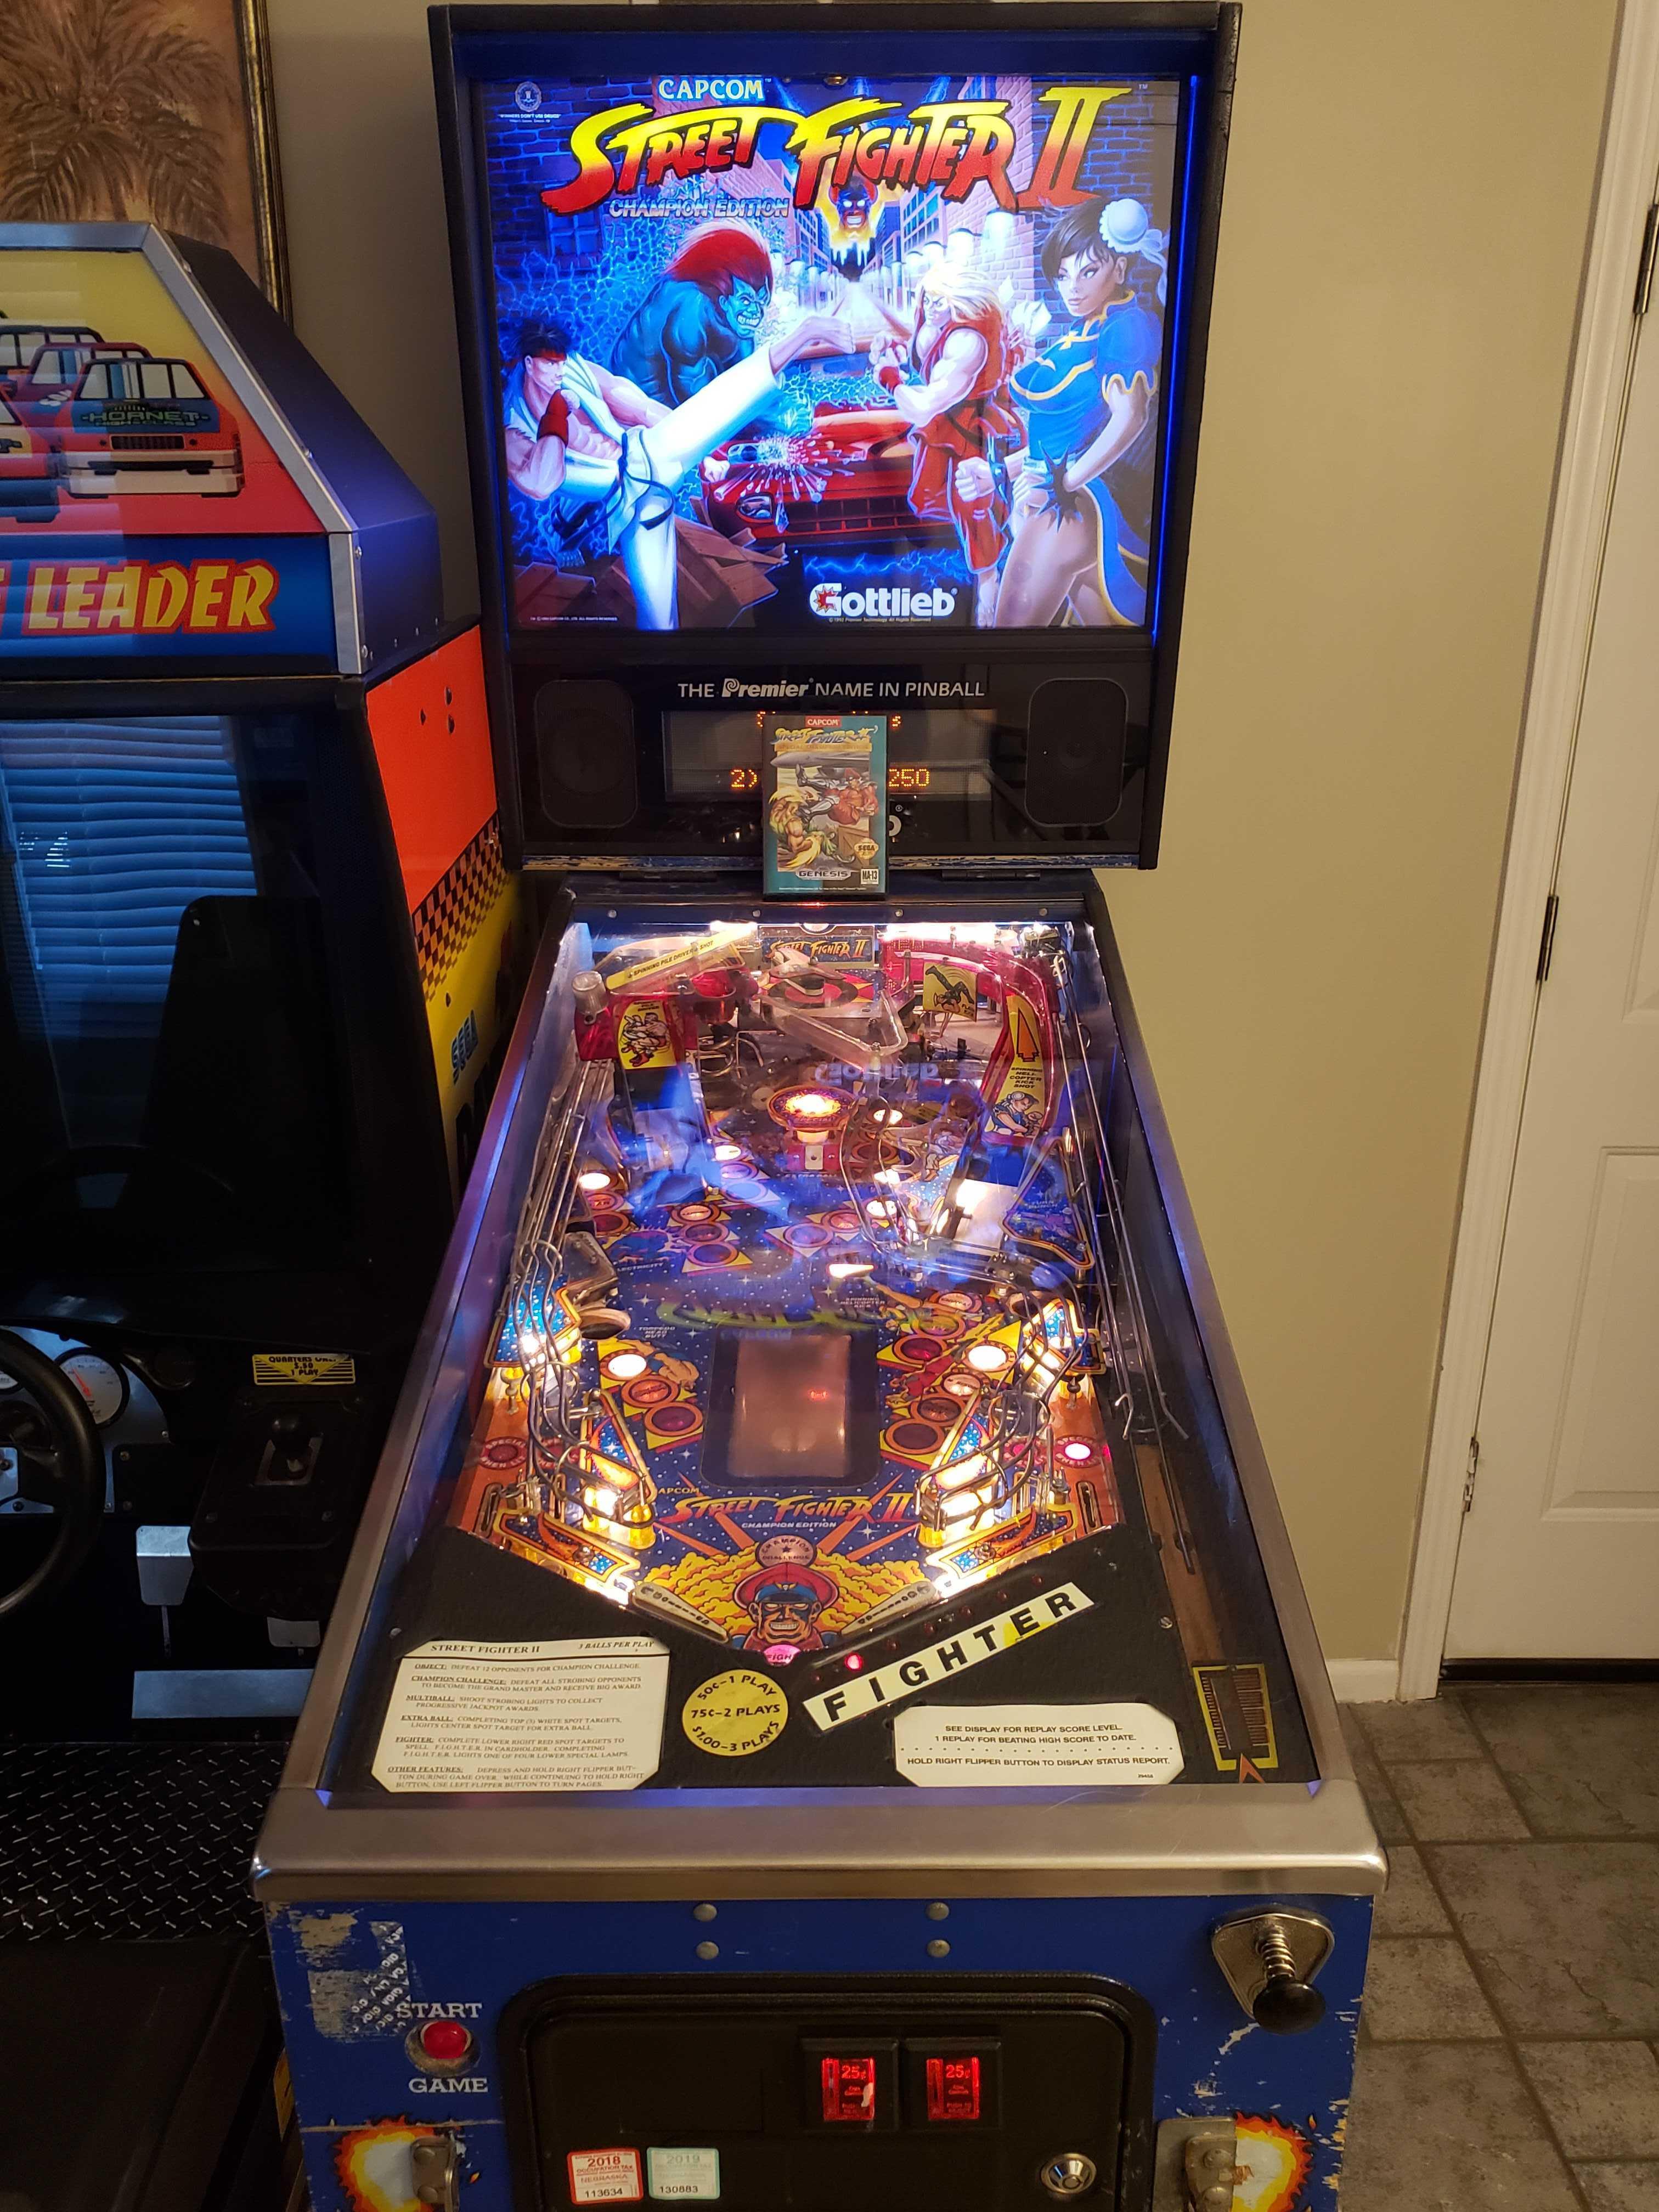 Arcade Cabinet Restoration of Streetfighter Pinball